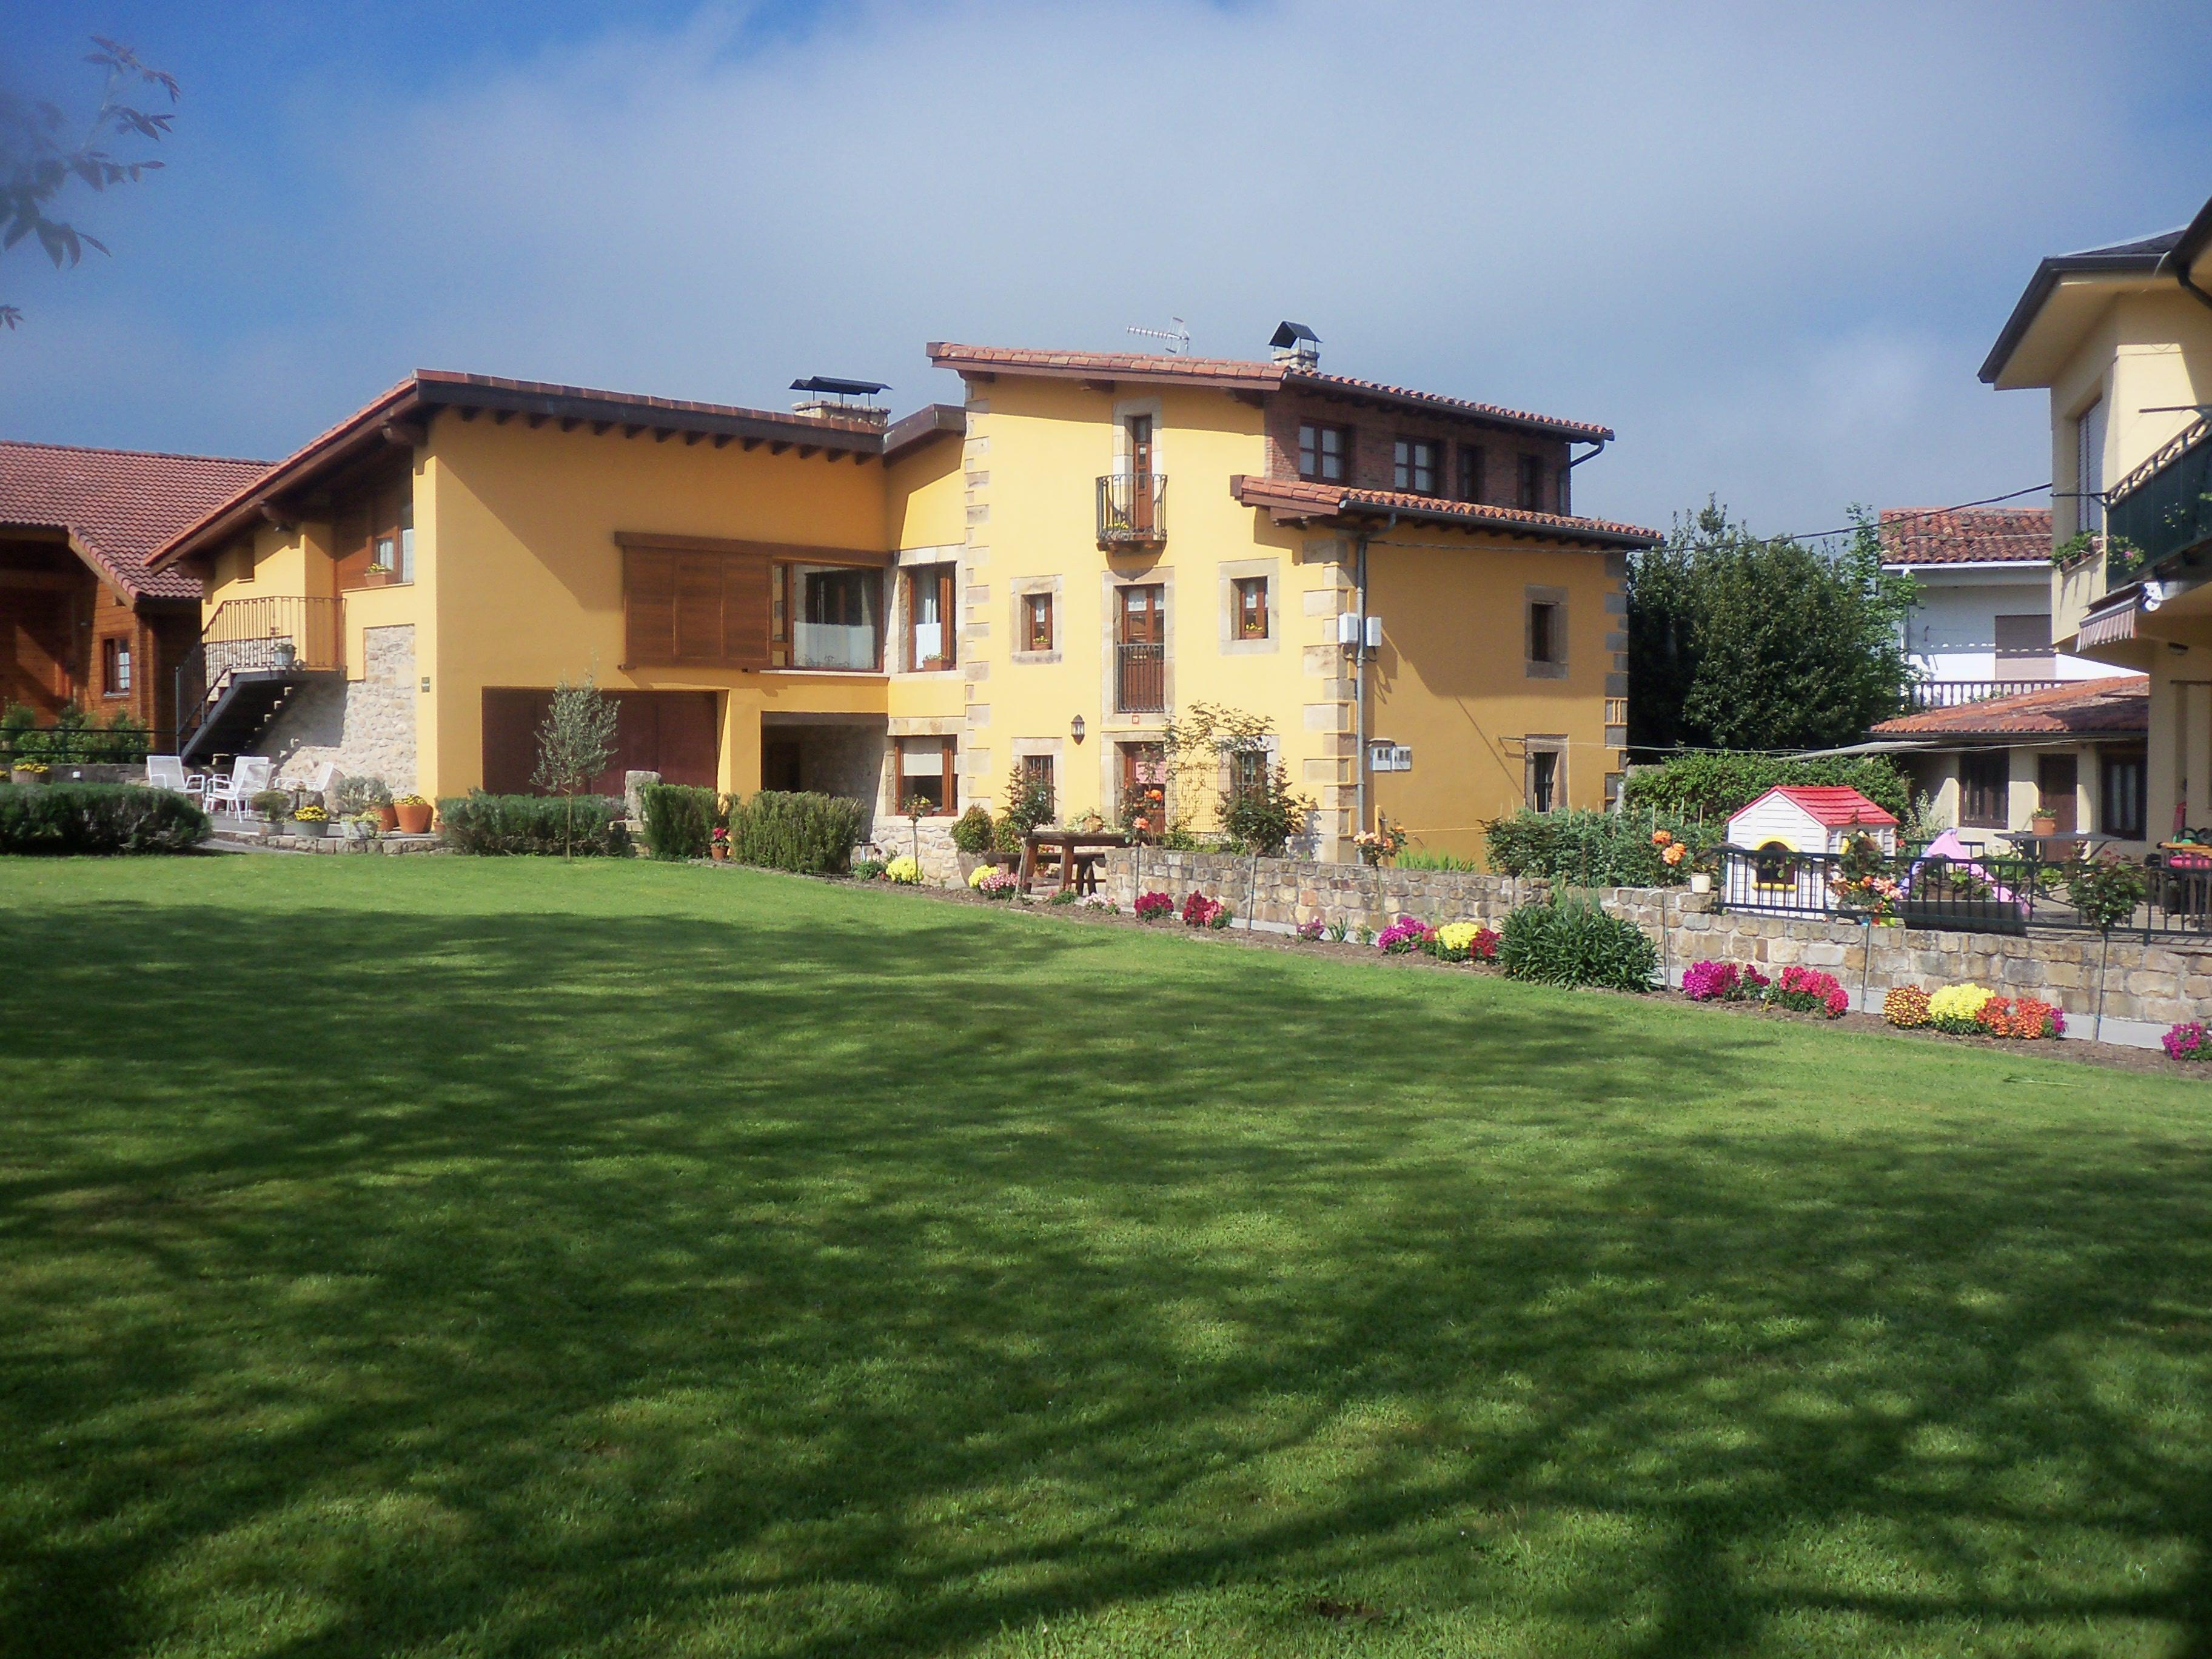 Fotos De La Casa Vieja De Sili Cantabria Silio